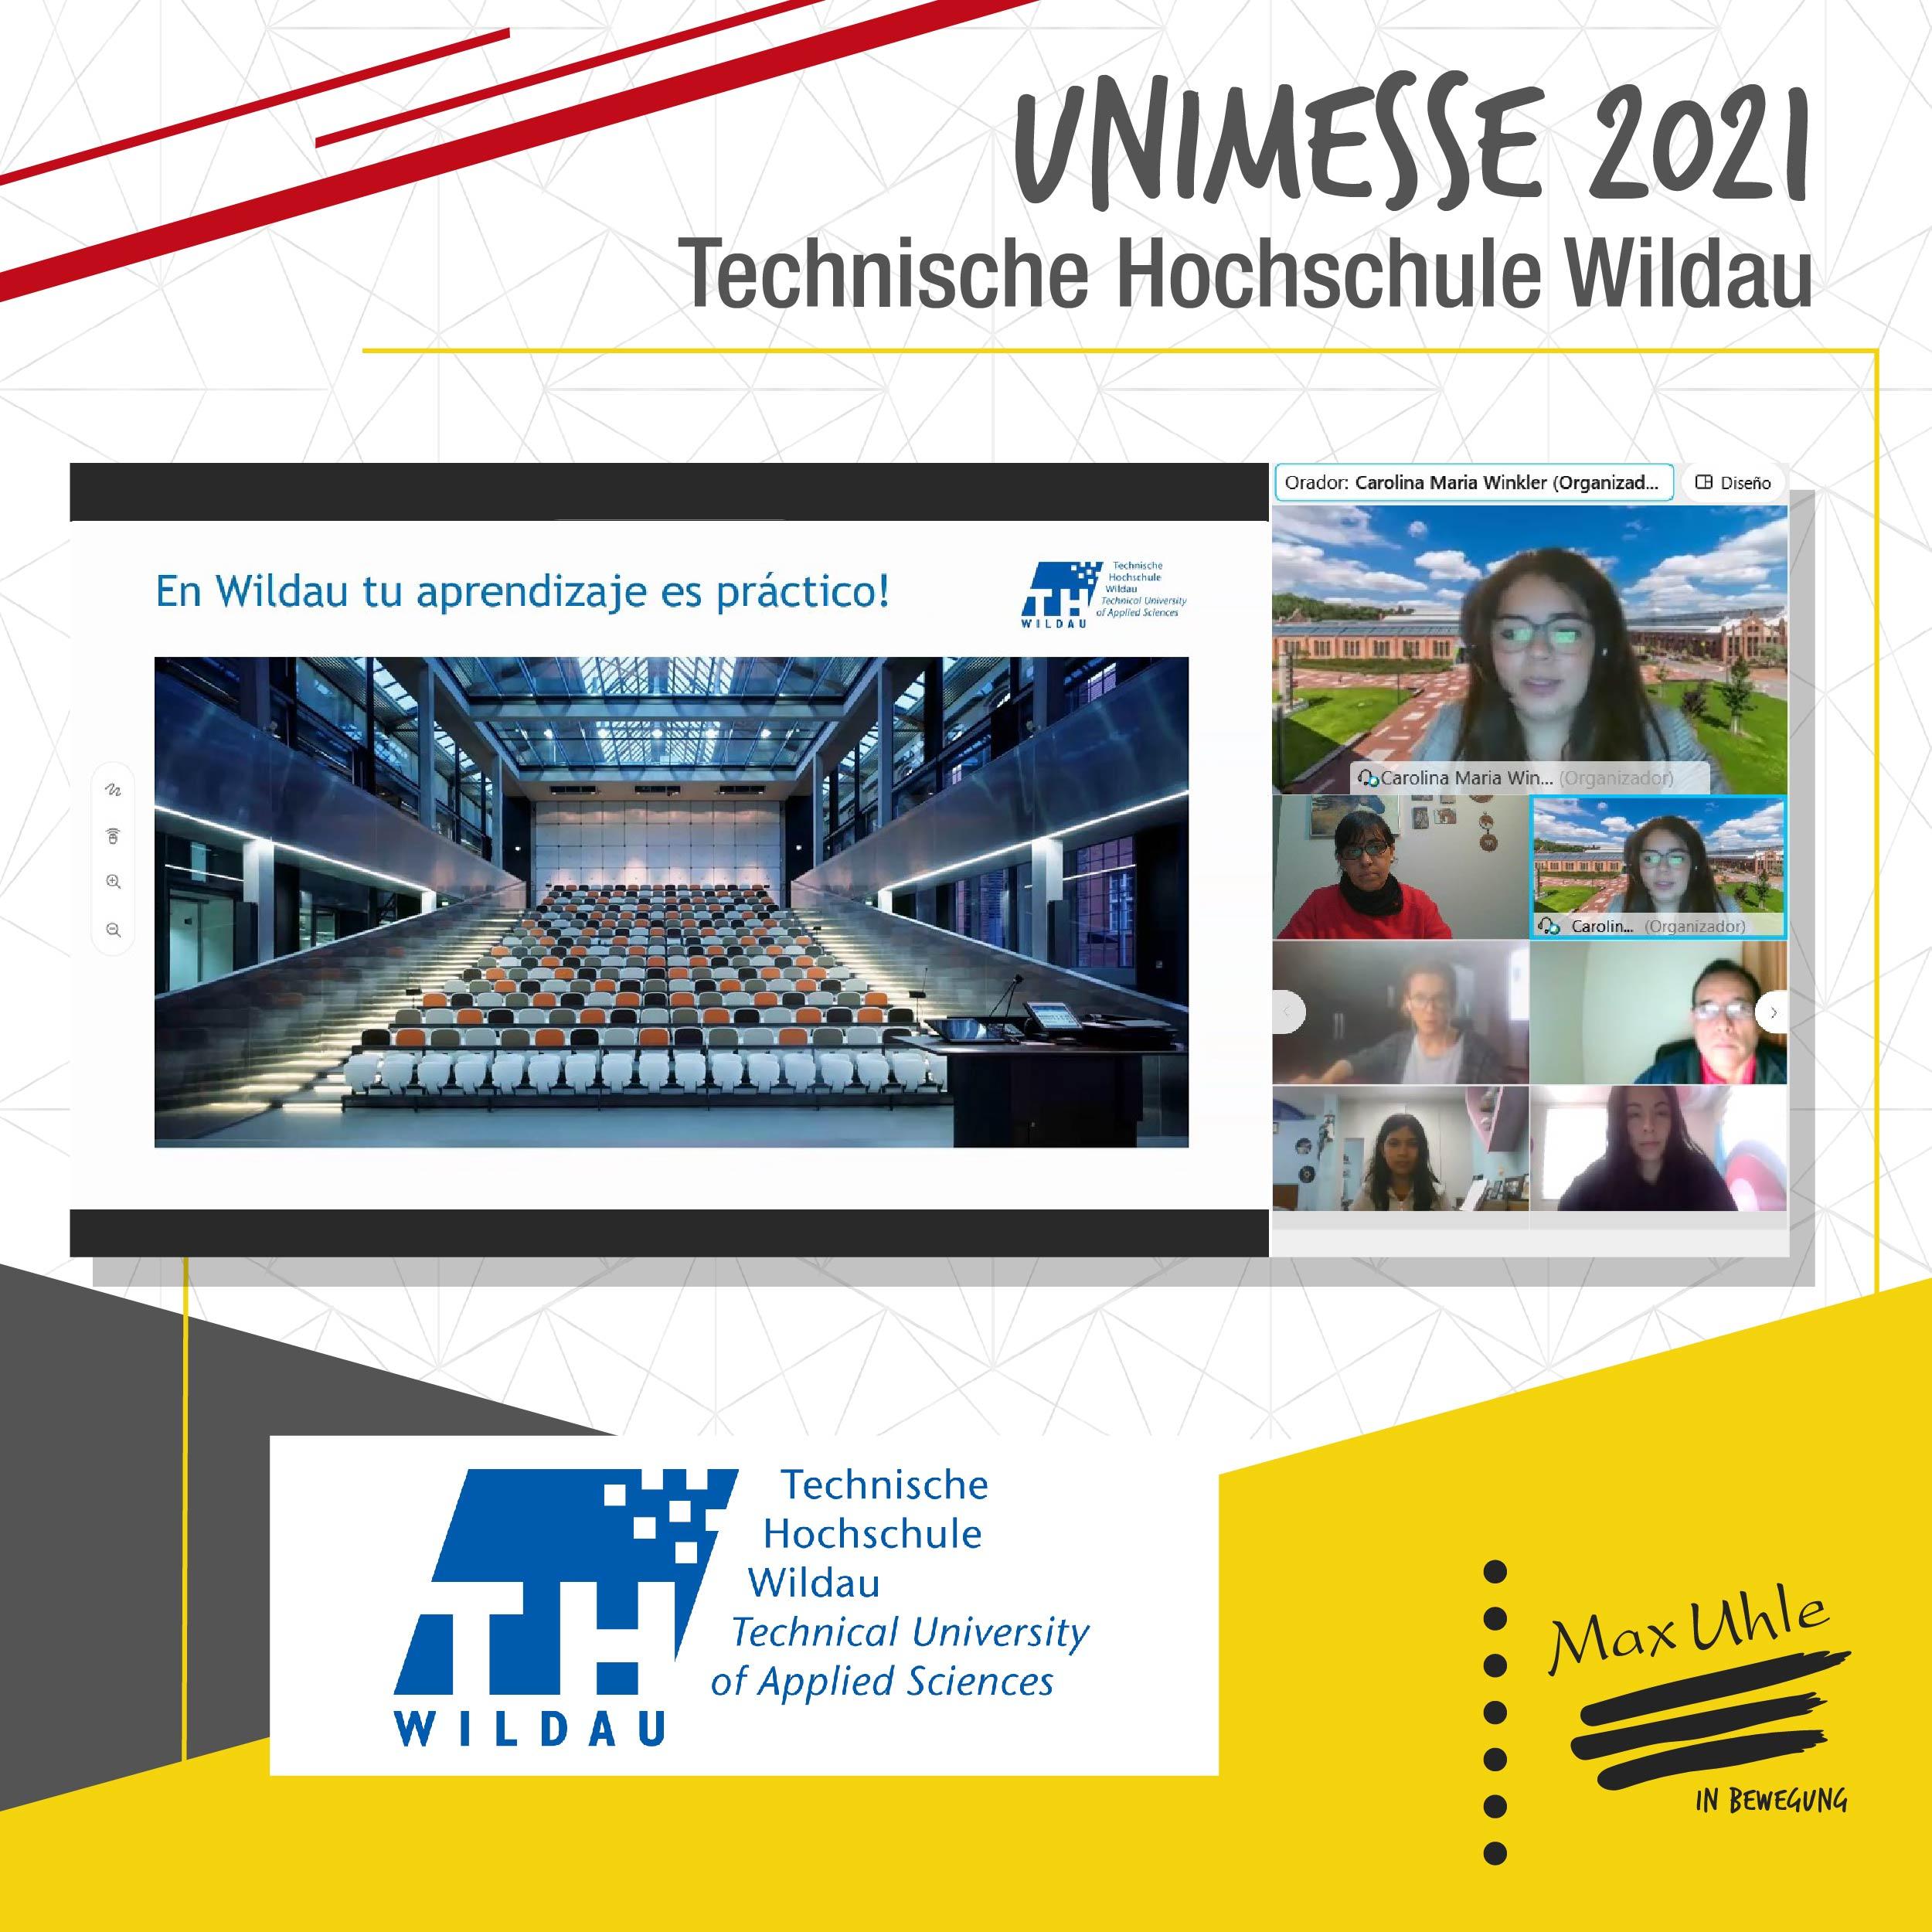 TH Wildau - Unimesse 2021 Colegio Max Uhle